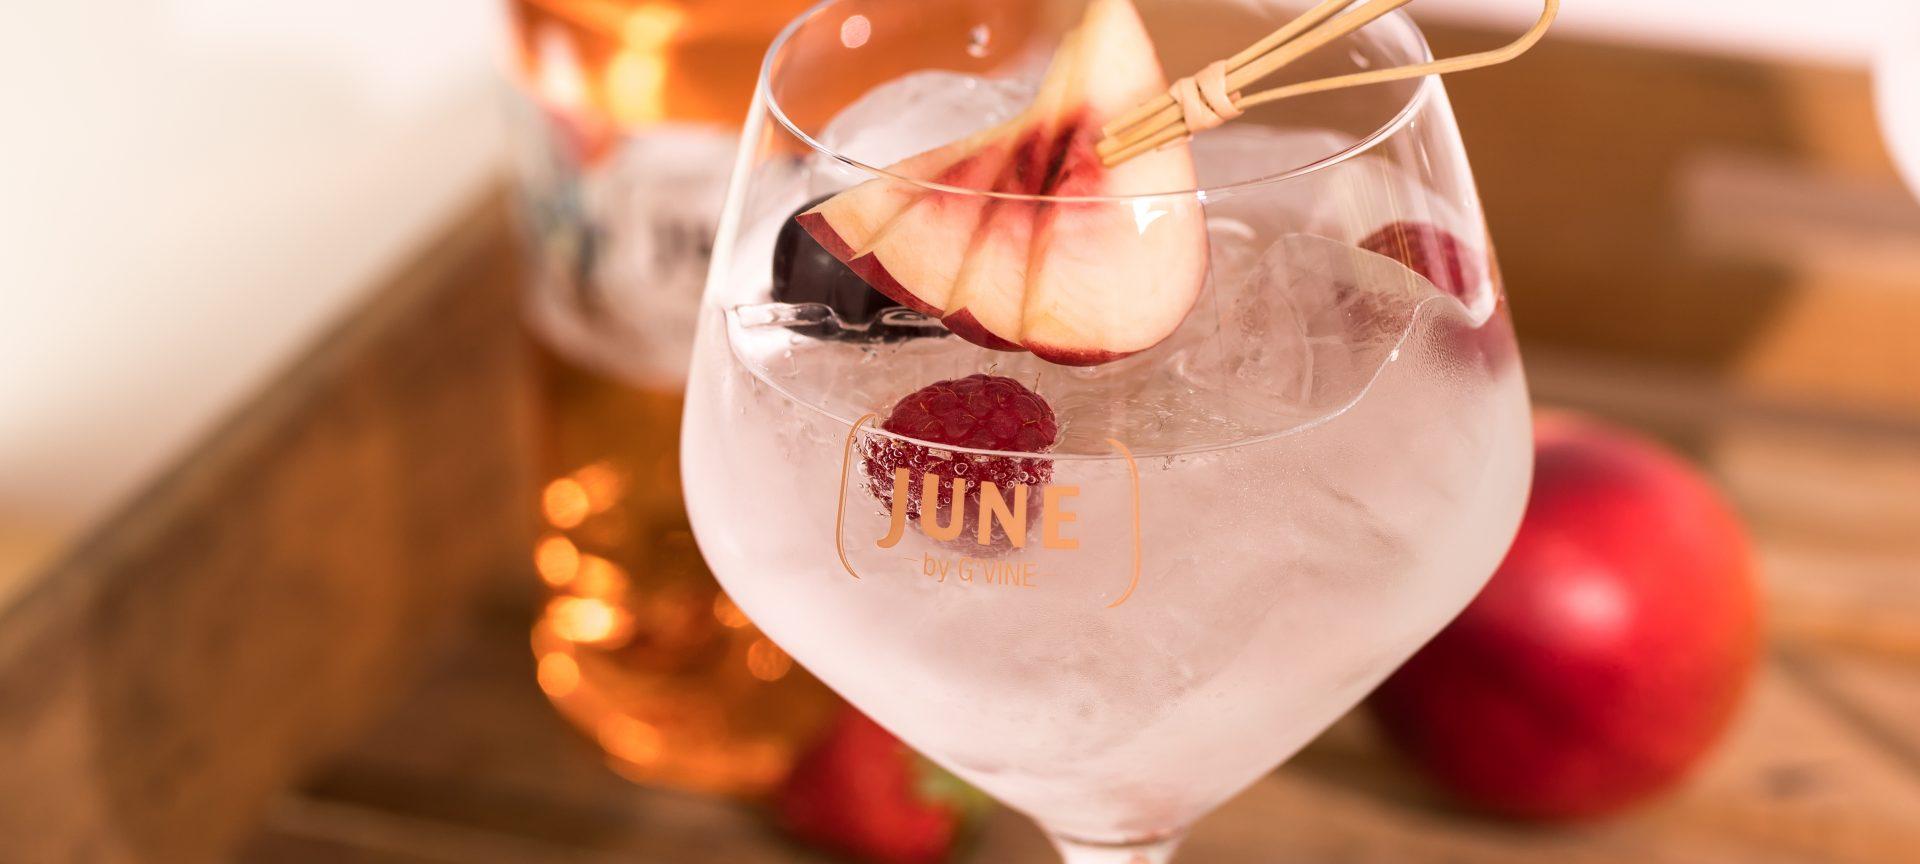 JUNE BY G'VINE, THE TASTE OF AN ENDLESS SUMMER